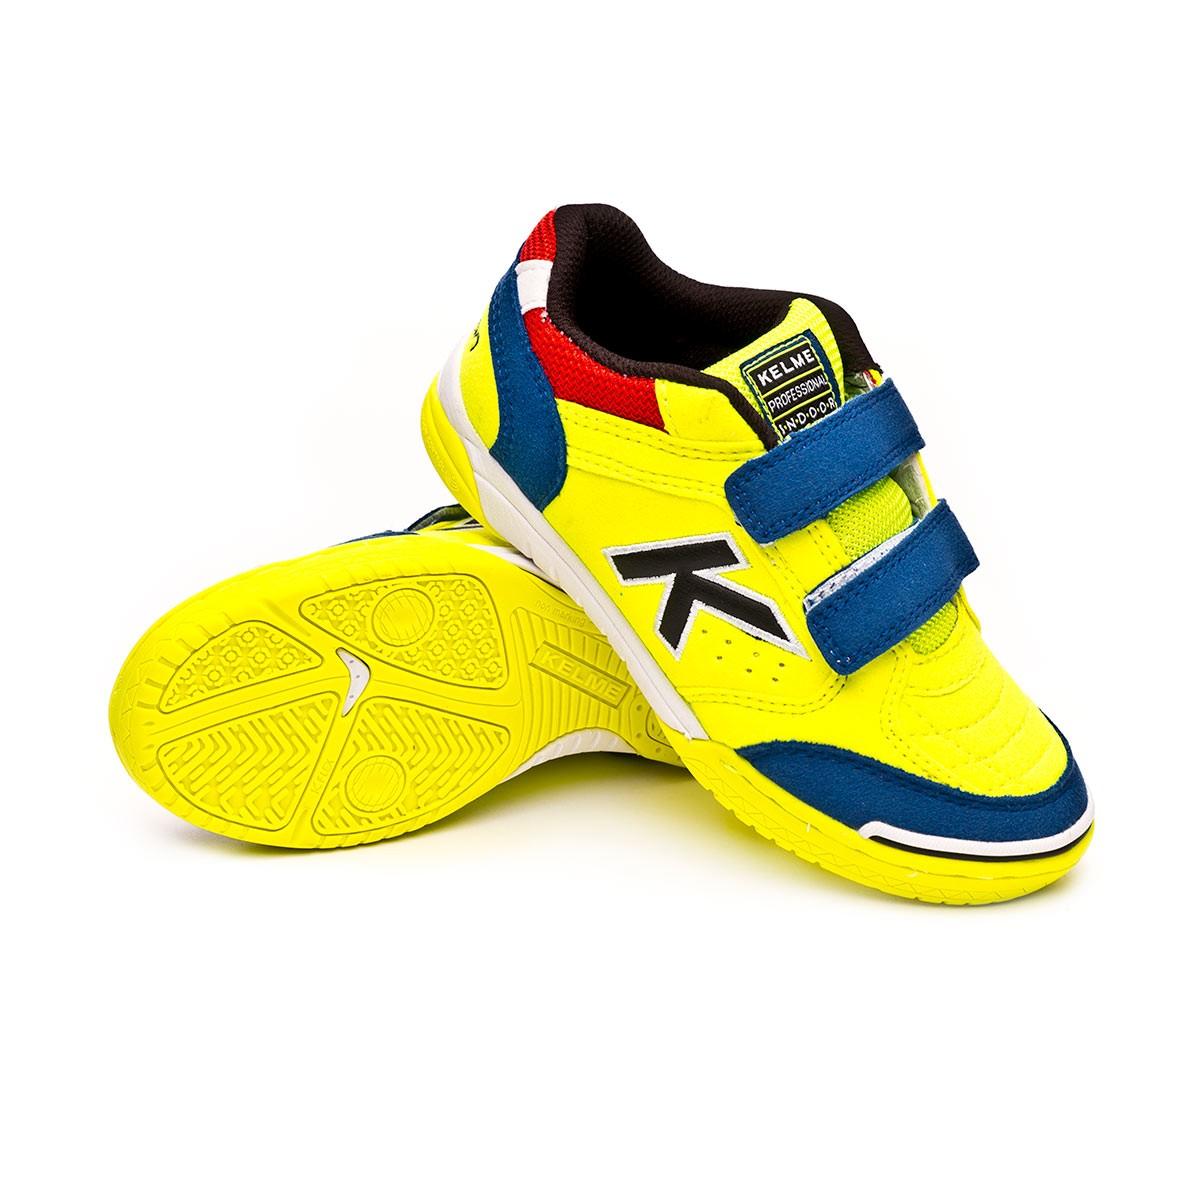 ca1155c49e6 Futsal Boot Kelme Kids Precision Velcro Lime-Blue - Football store ...